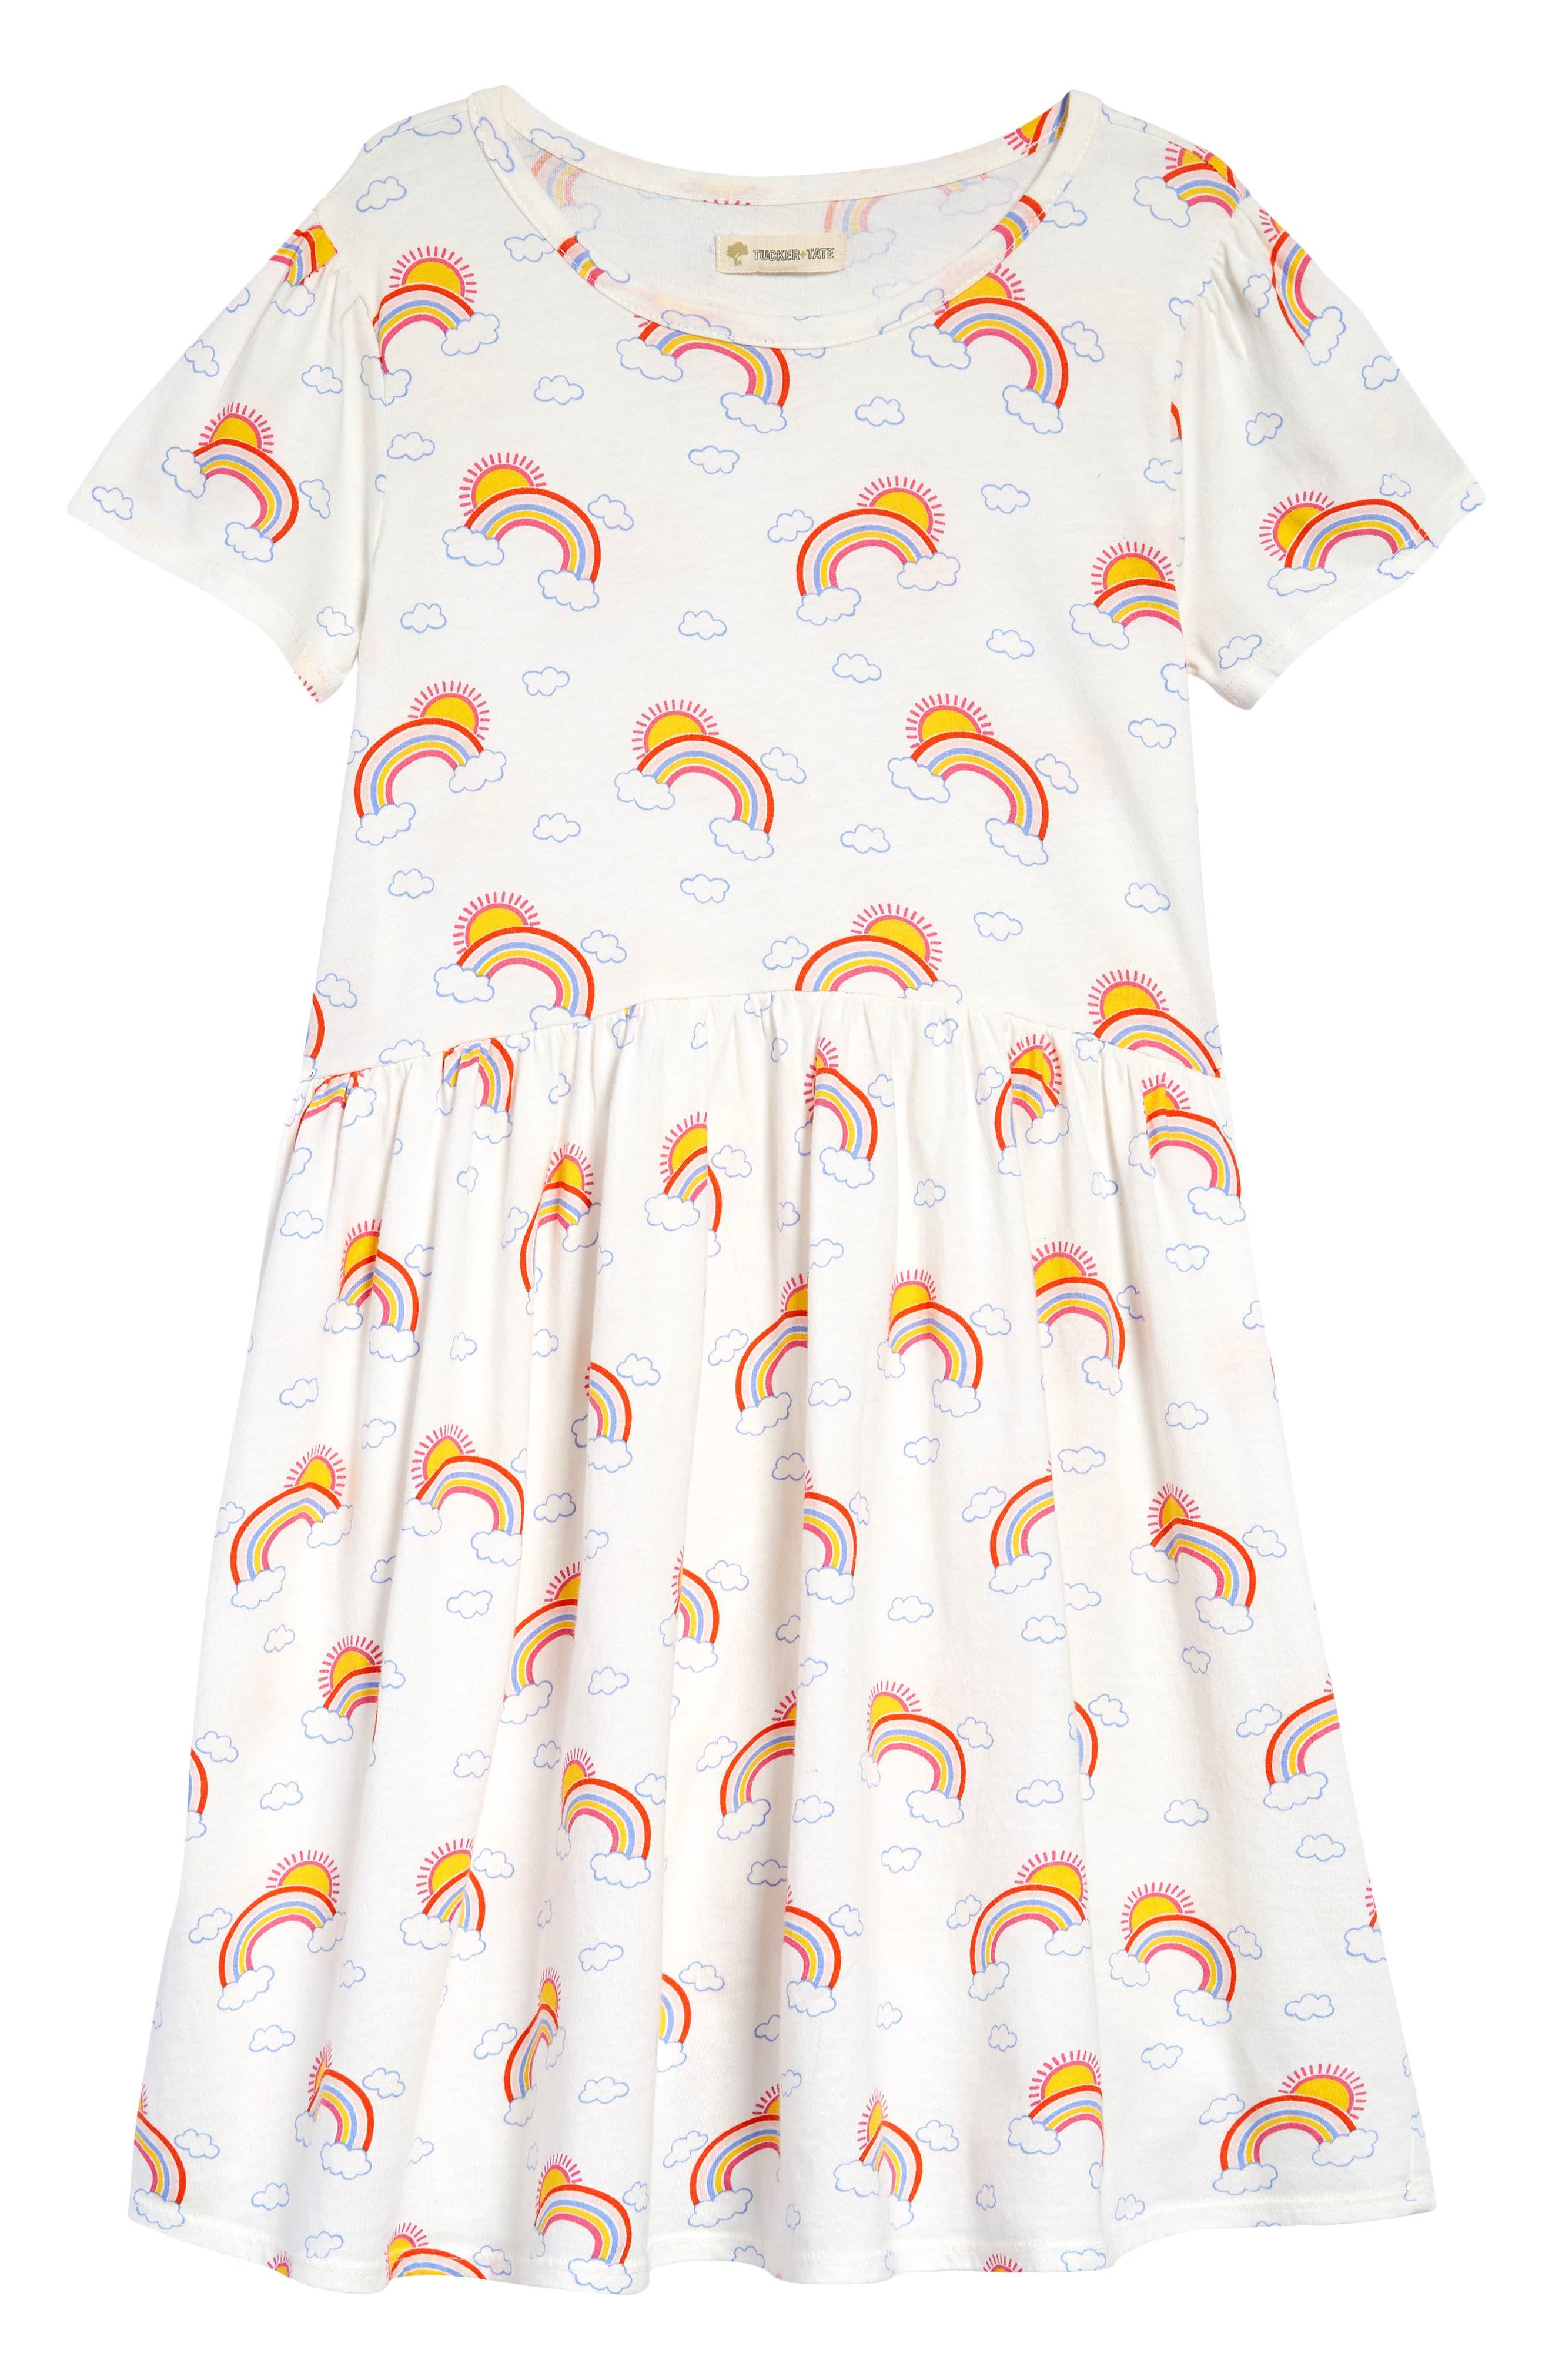 Image of Tucker + Tate Printed Short Sleeve Dress